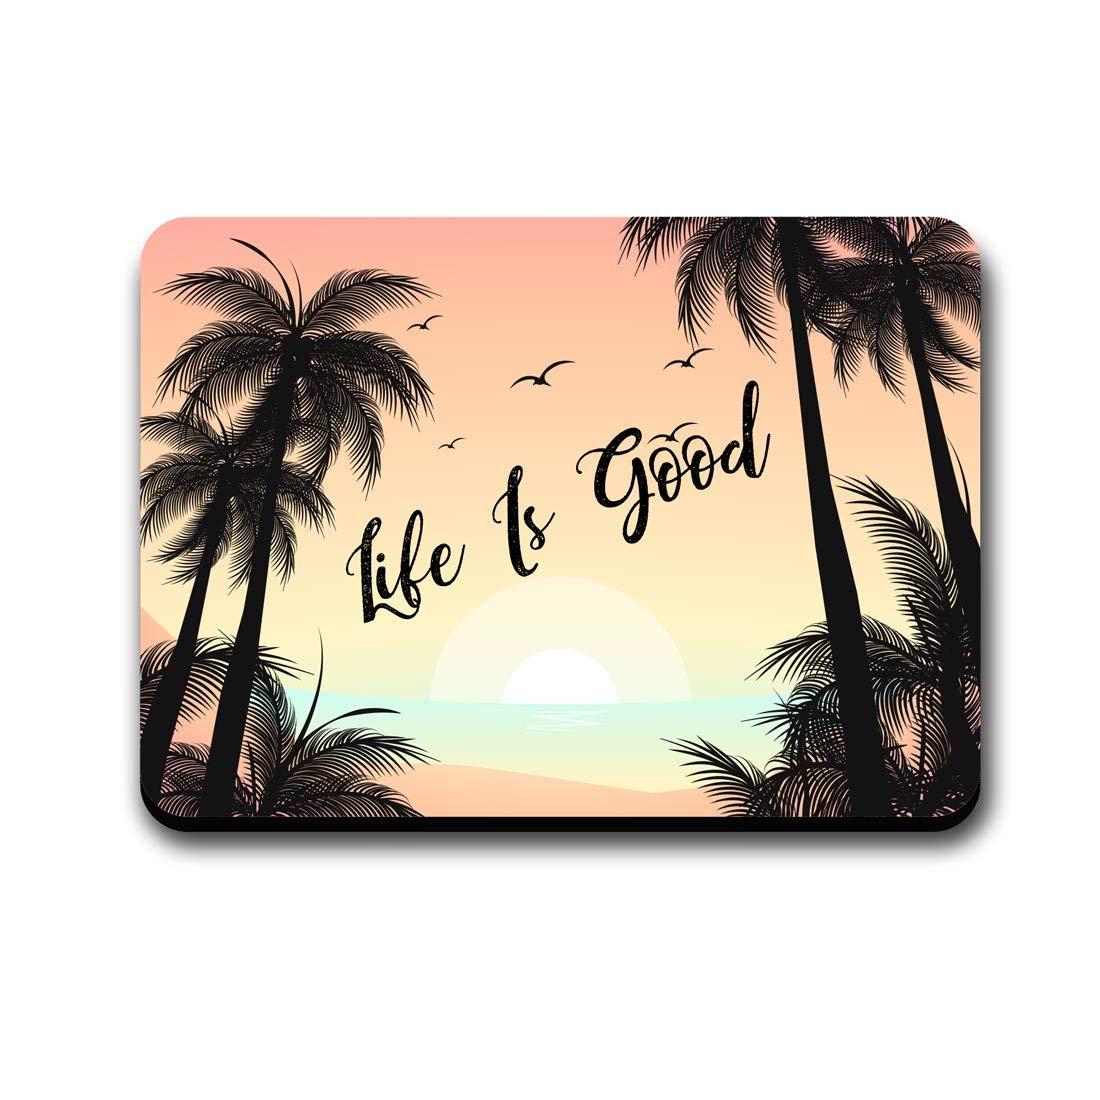 Buy Seven Rays Good Vibes & Colors Fridge Magnet for Office